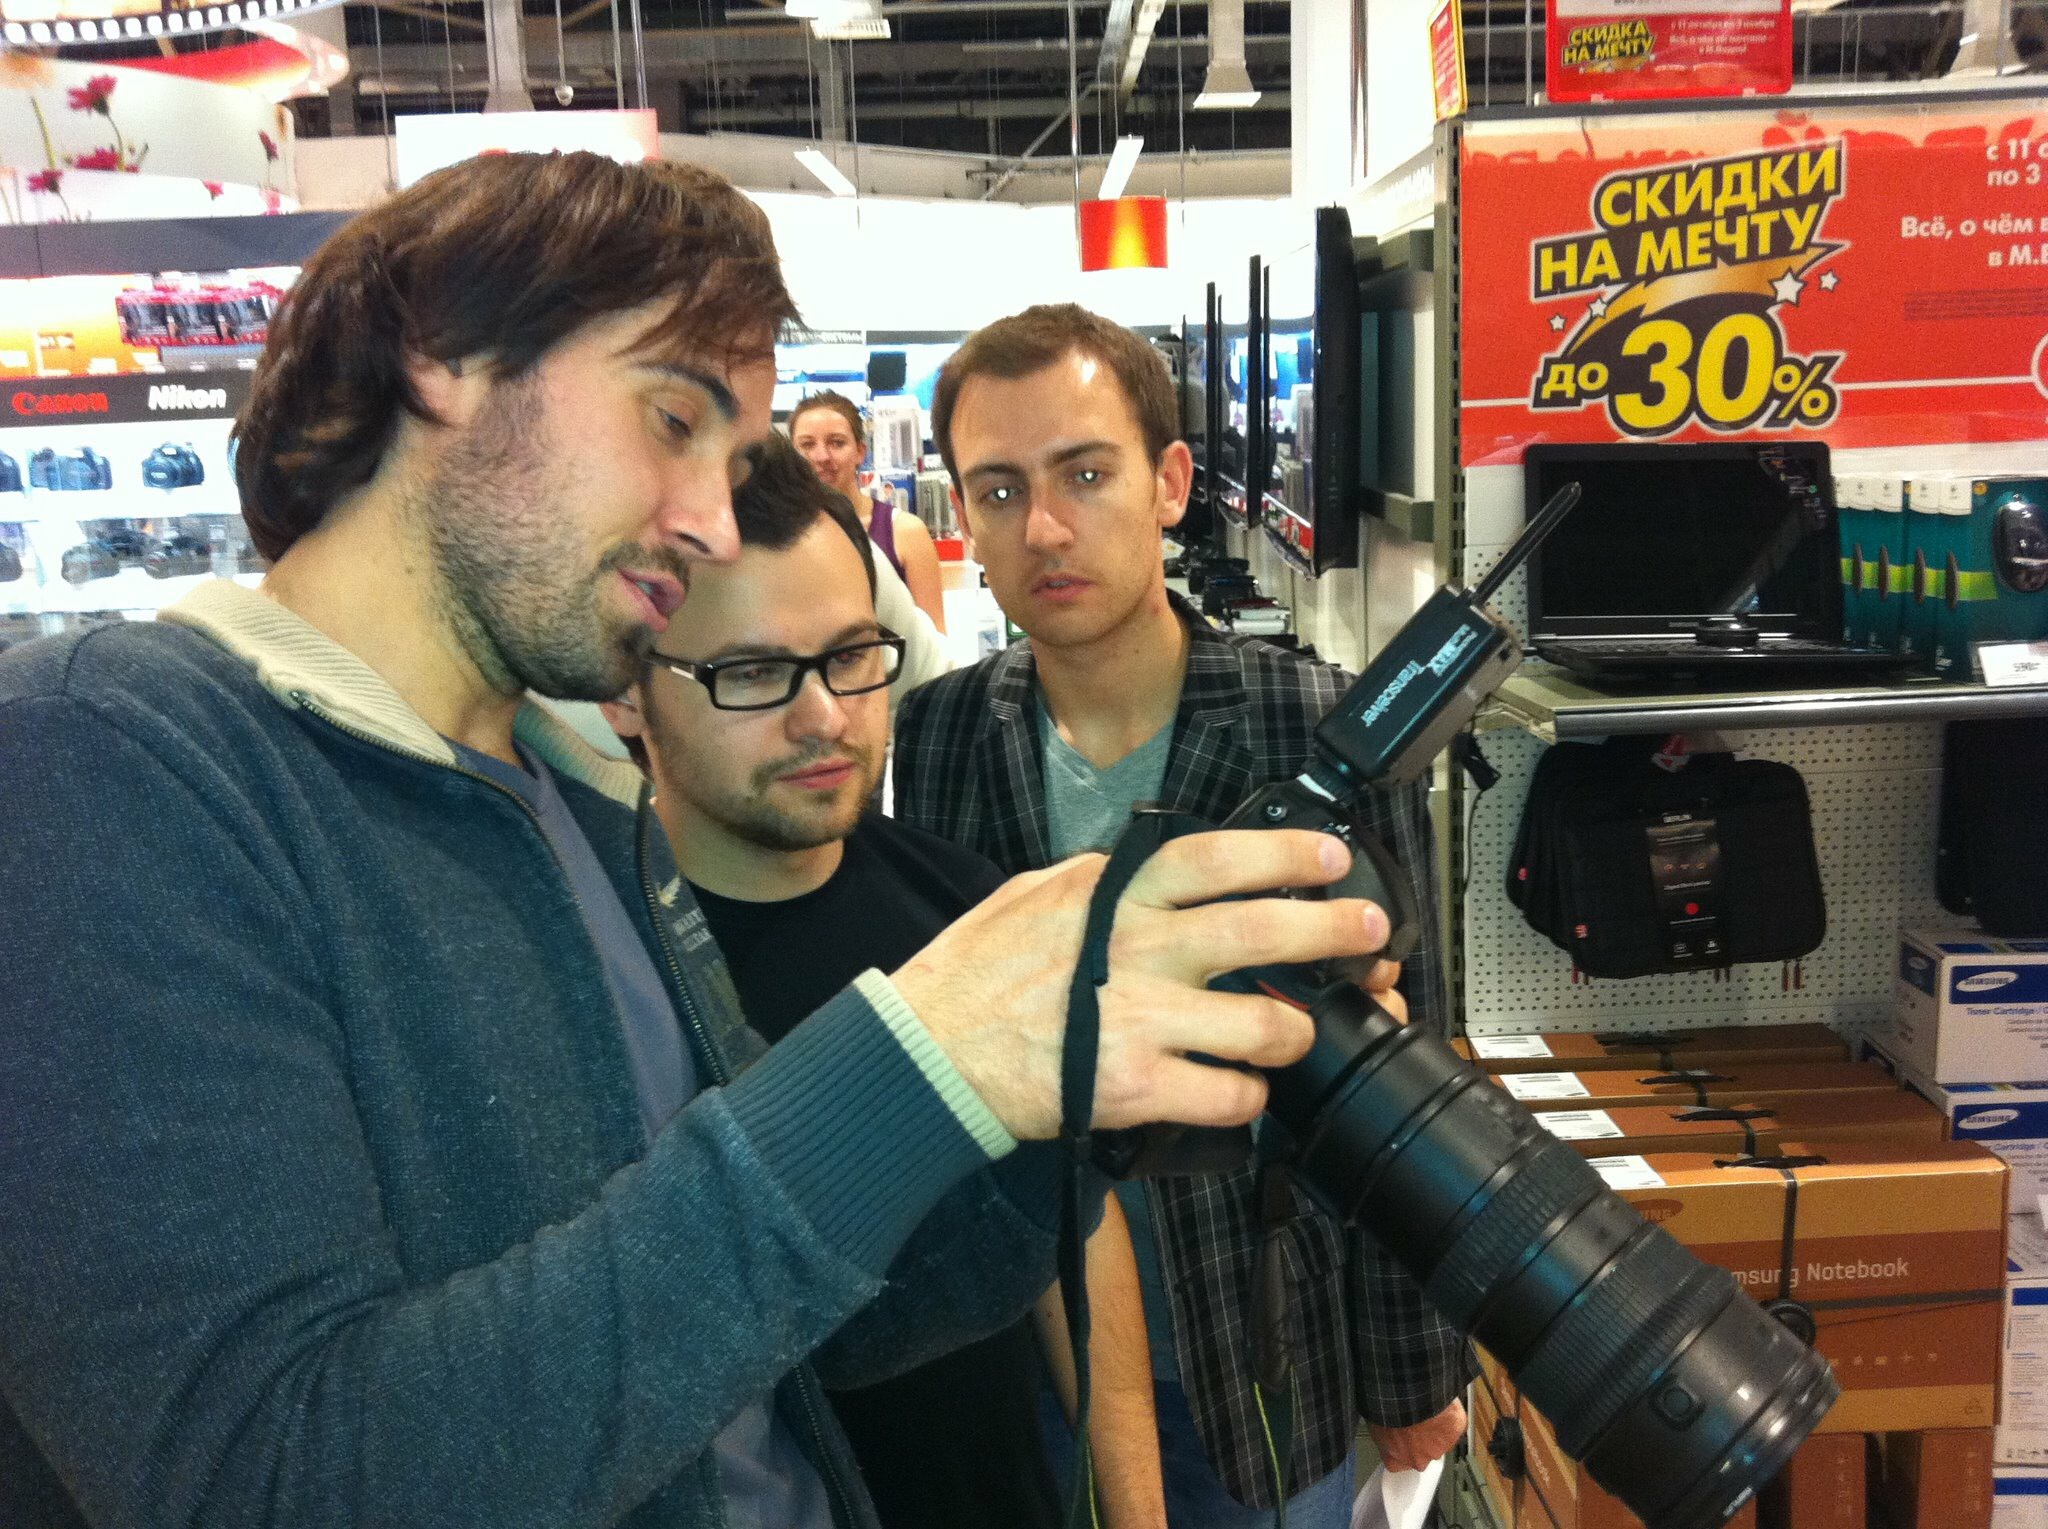 Съёмки проекта «Лица компании» для «М.Видео» в 2011 году